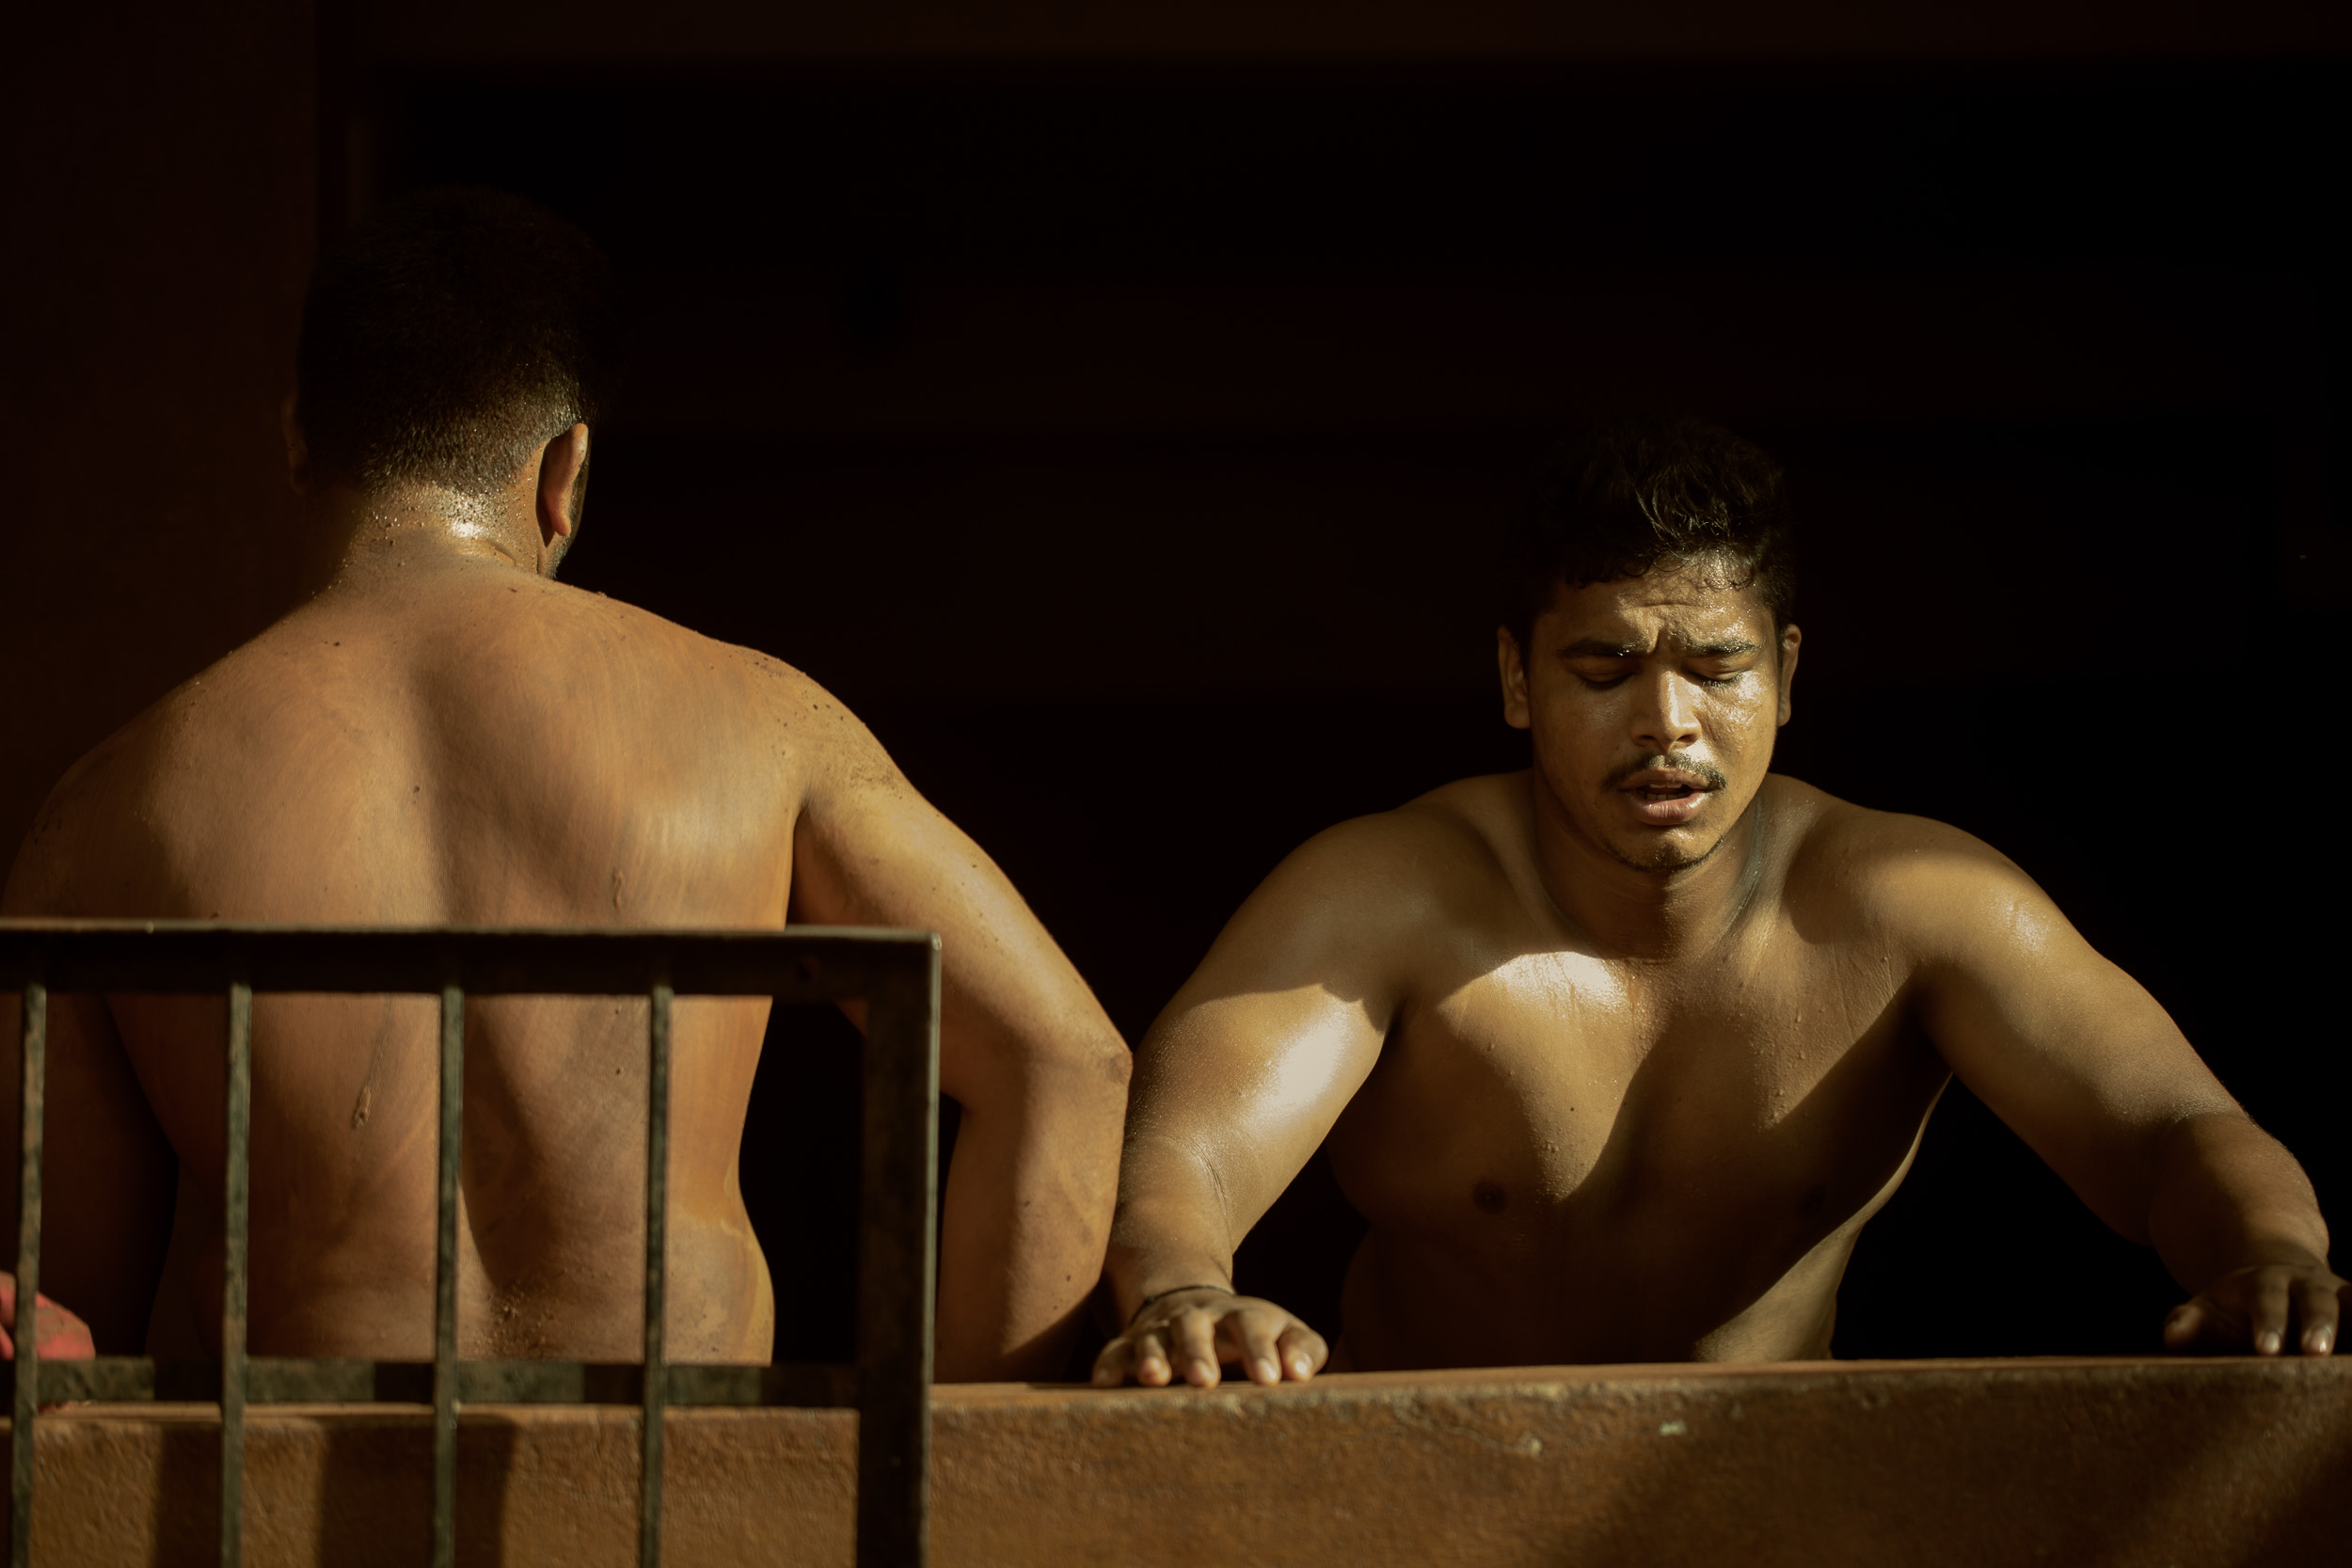 Sindhur_Photography_Travel_People_Wrestlers-26.JPG